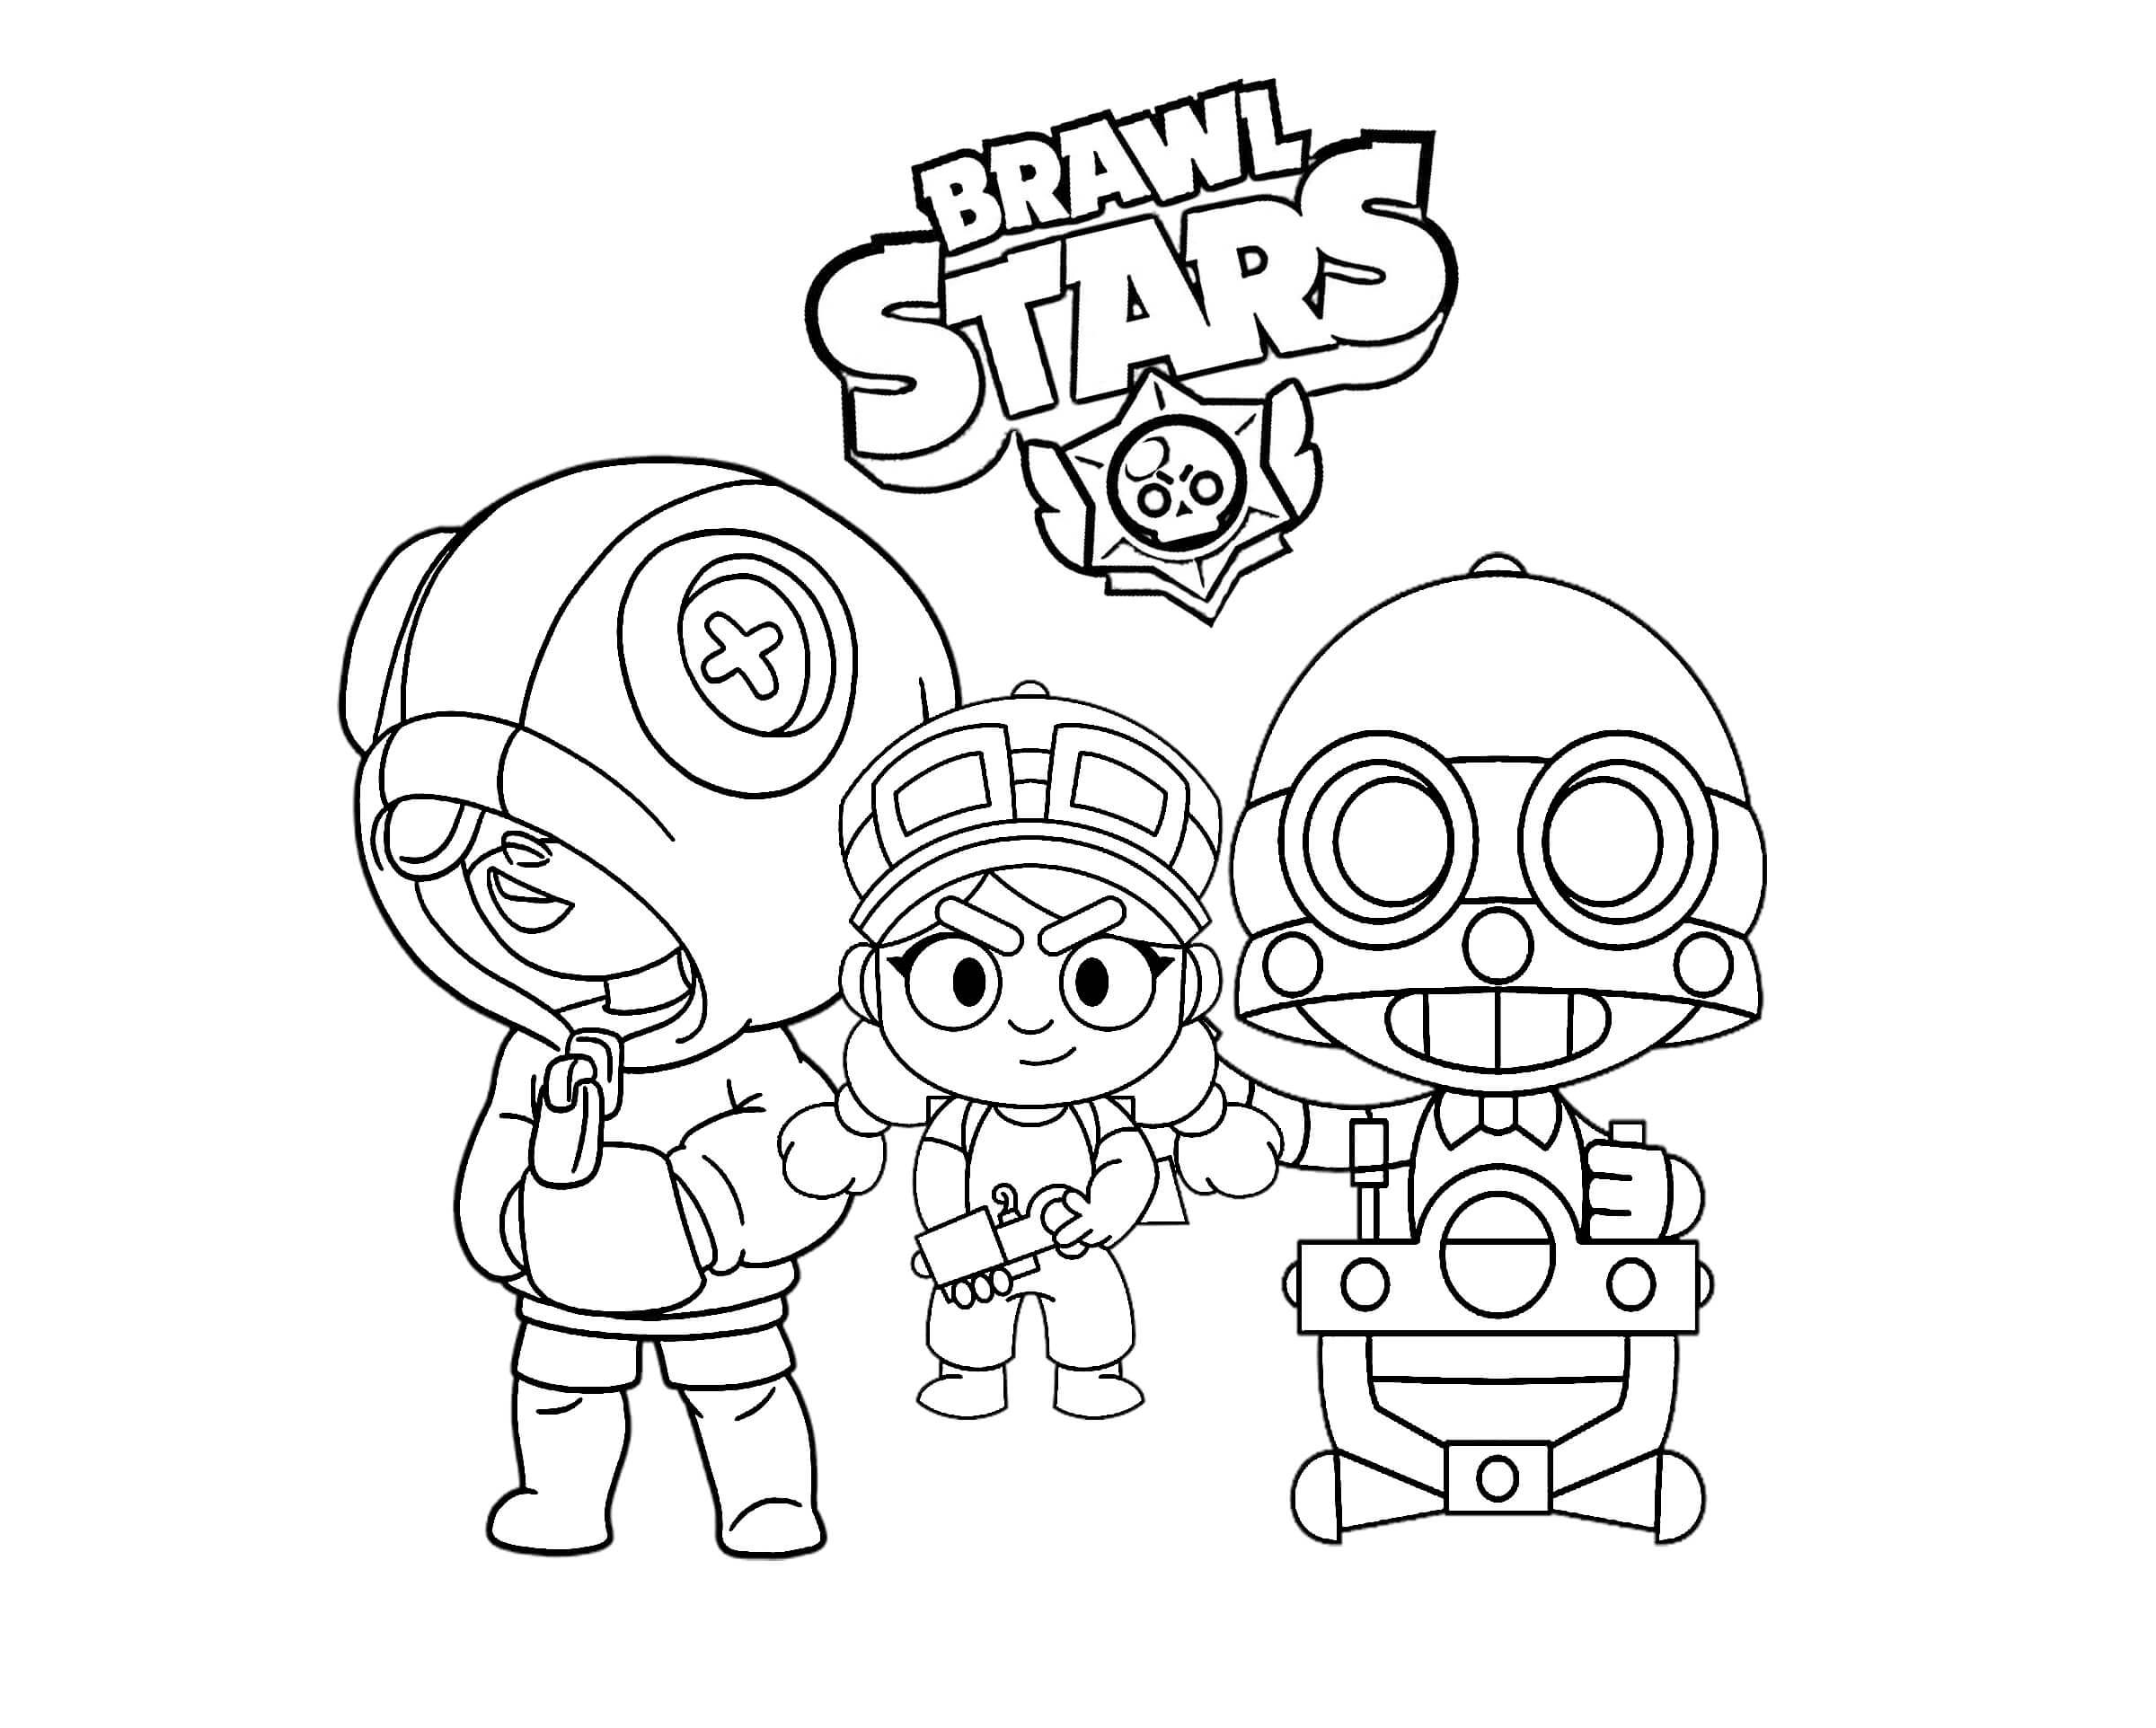 Раскраски Бравла Старса - Игра Brawl Stars - Бравл Старс ...